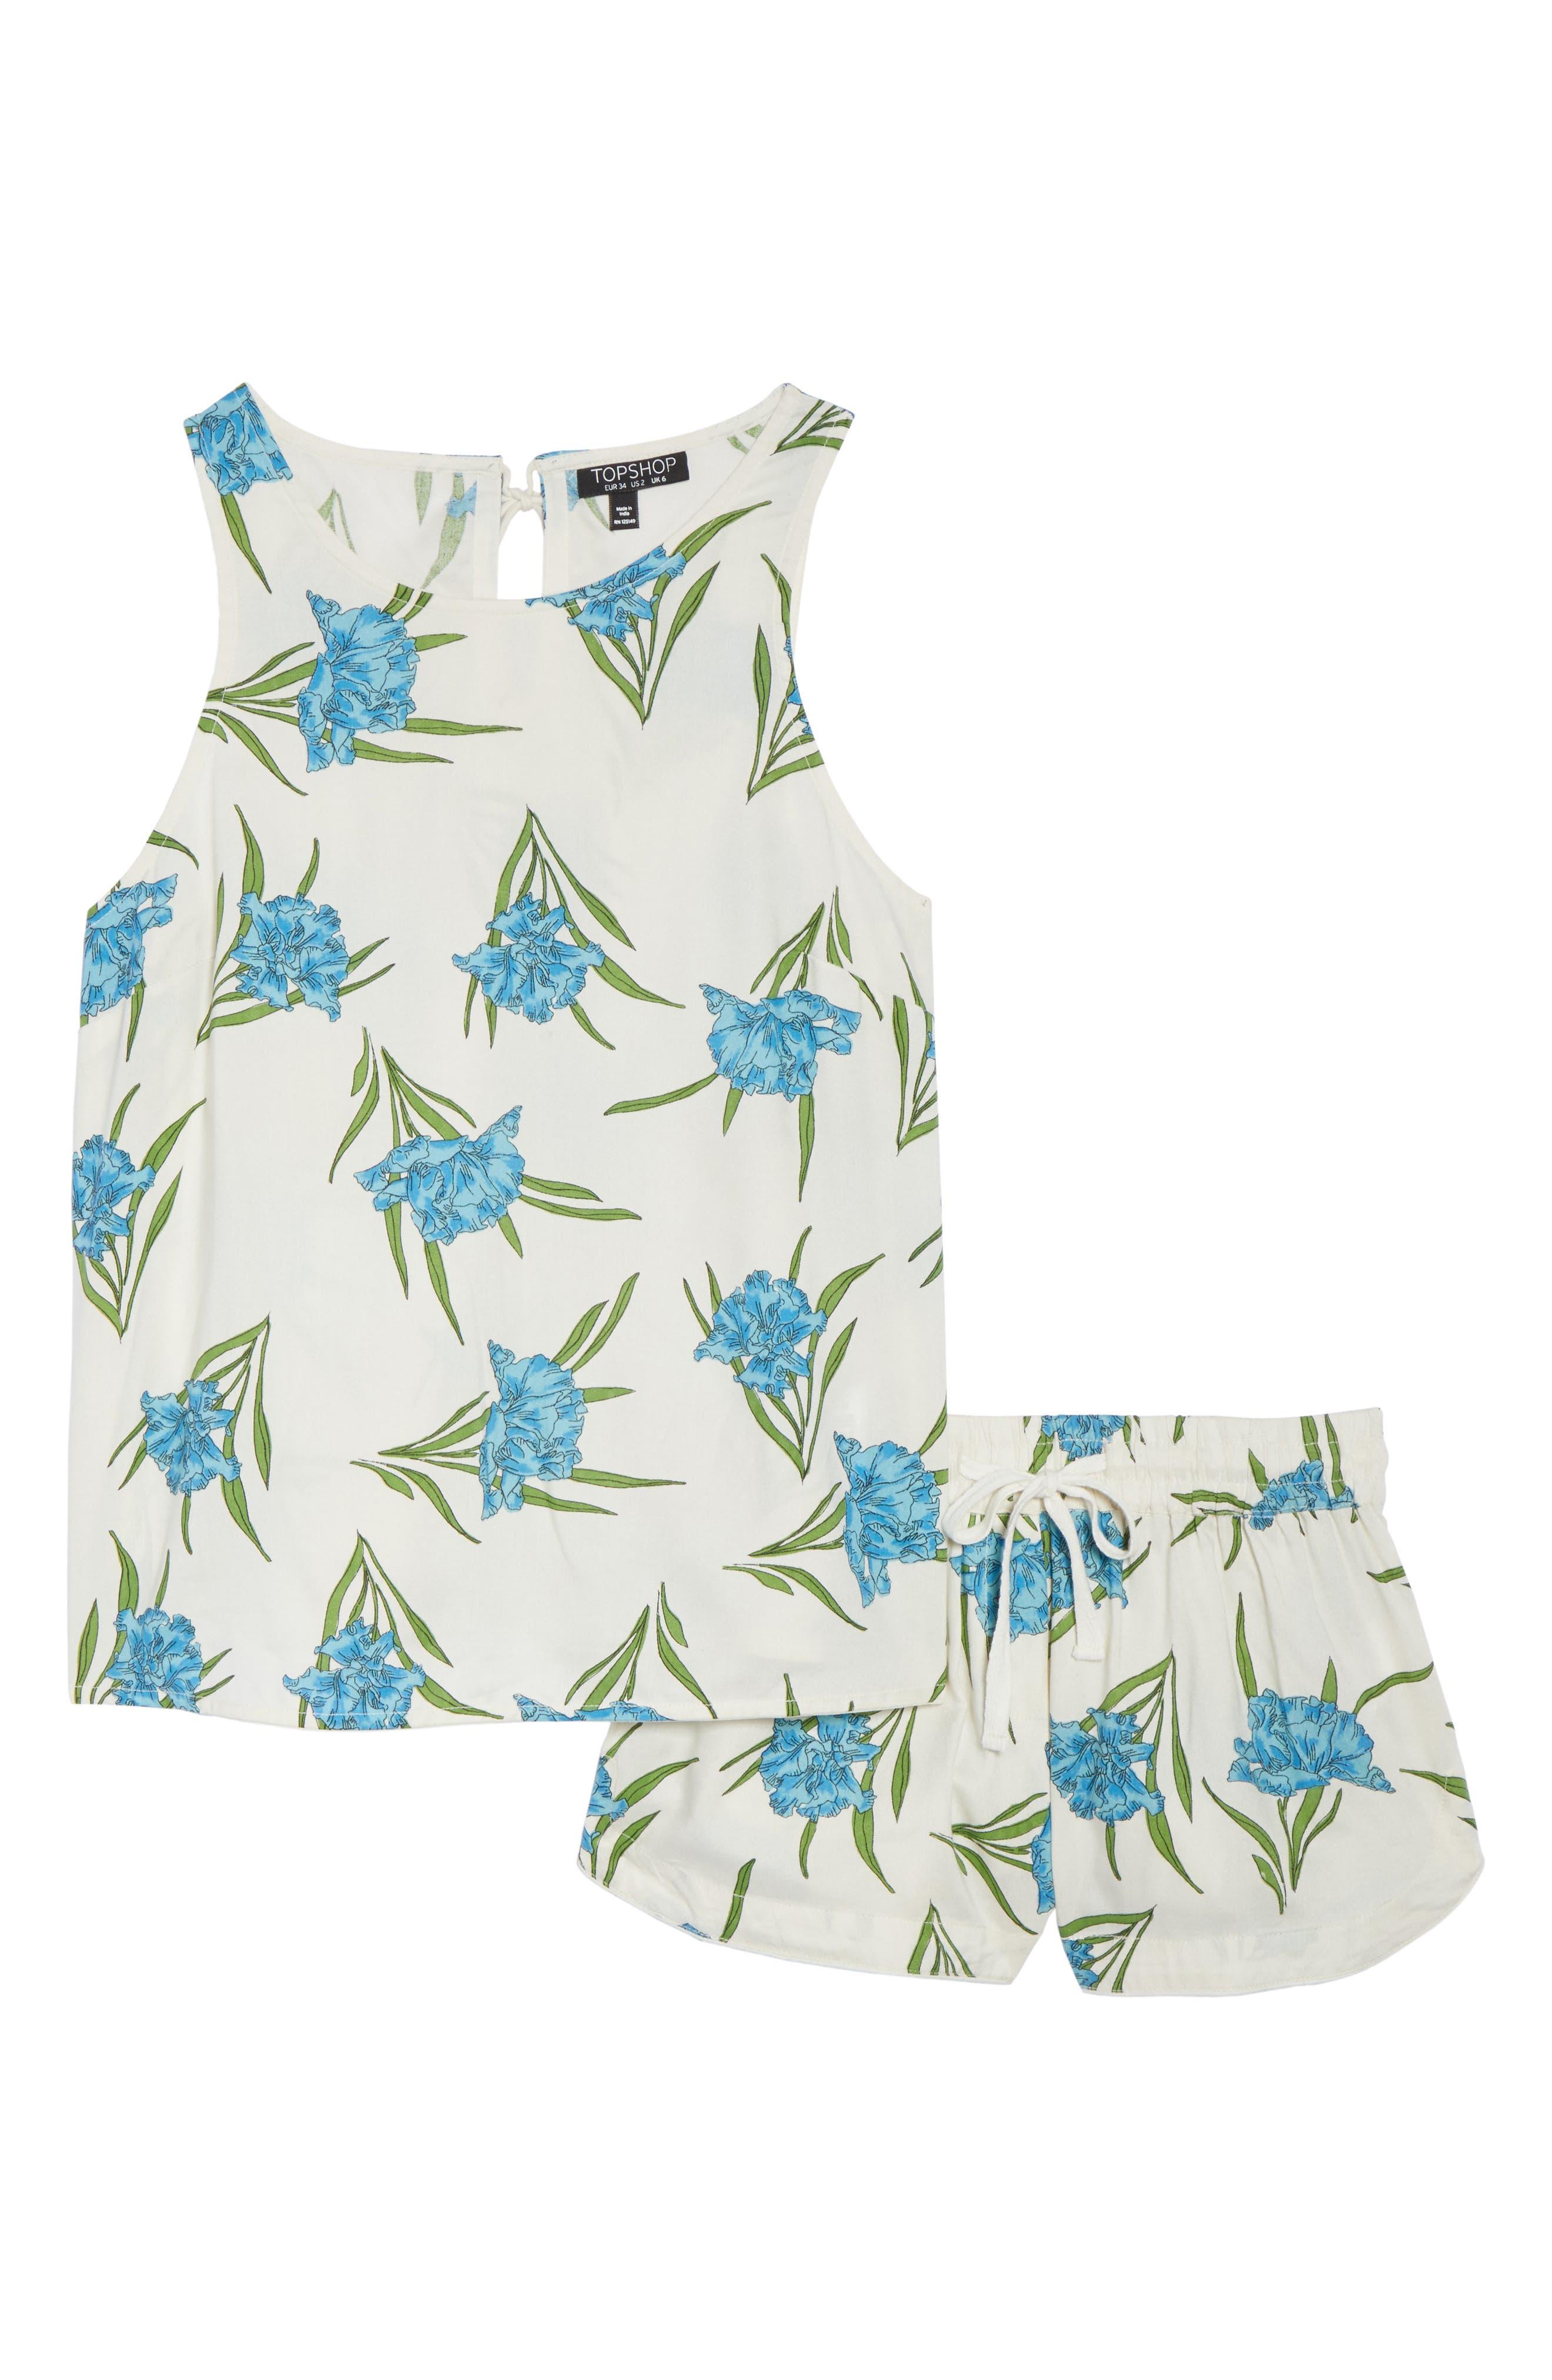 Botanical Short Pajamas,                             Alternate thumbnail 7, color,                             900